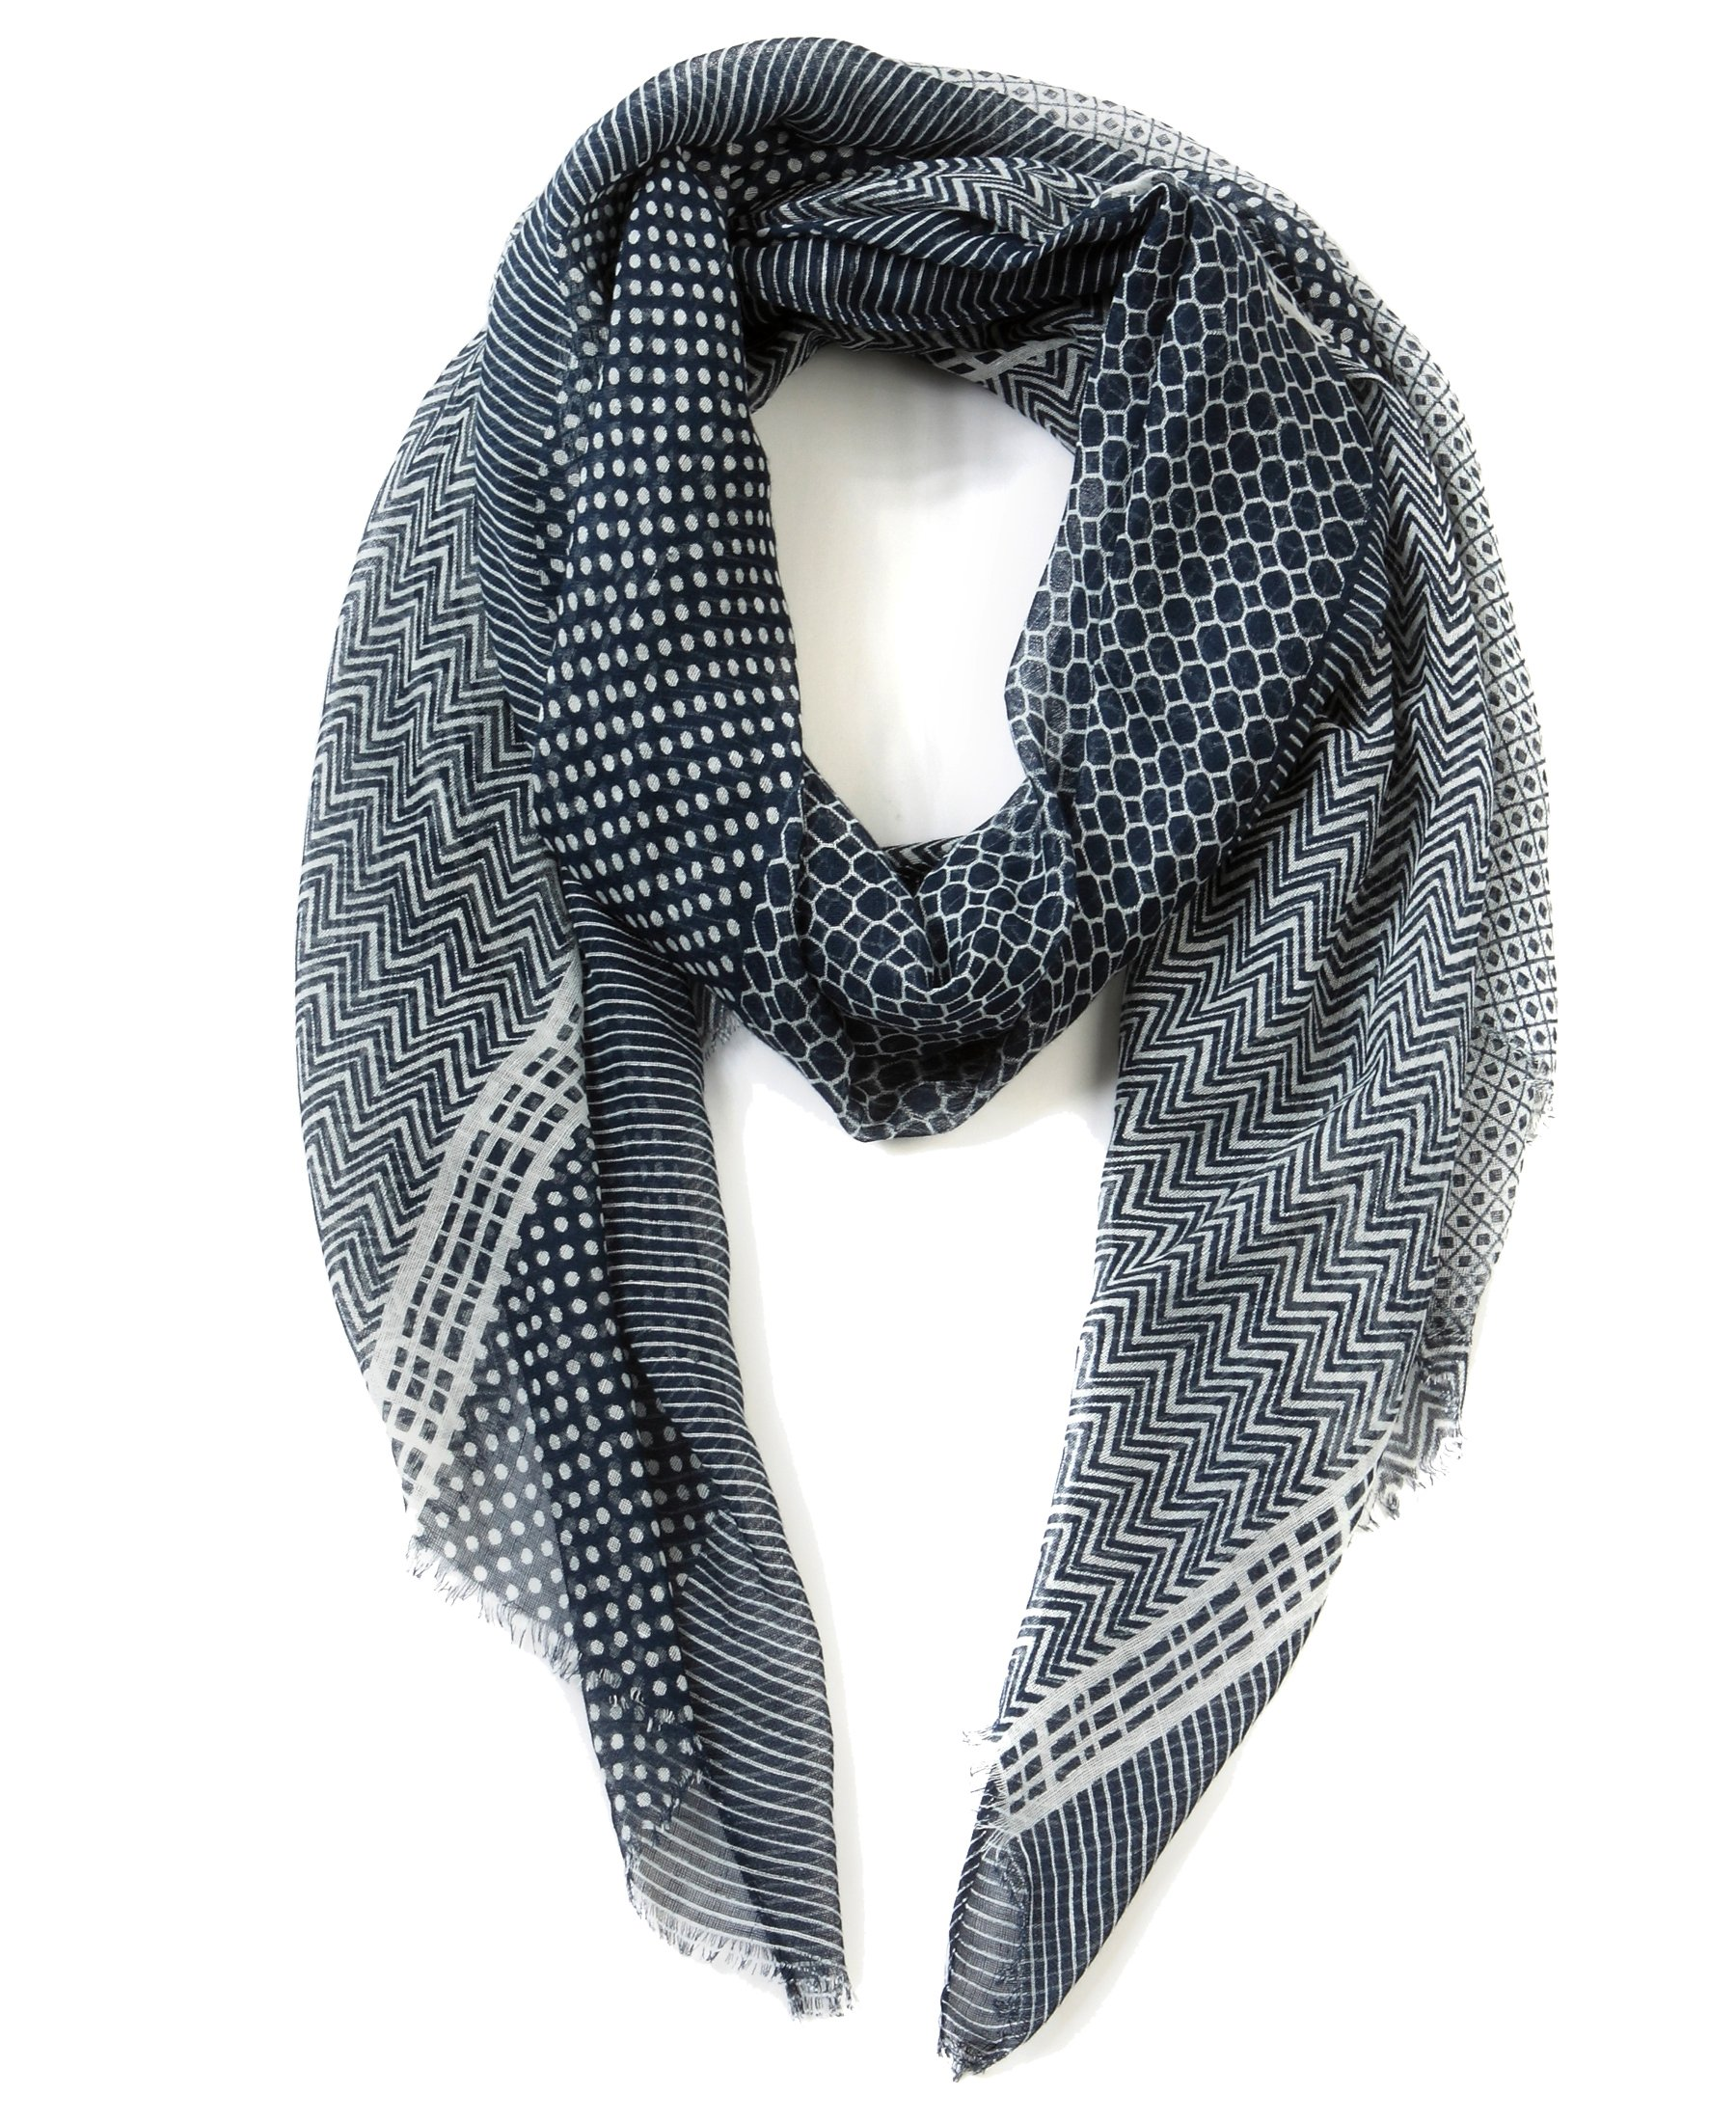 EUPHIE YING Women's Classy Scarves Fashion Soft Shawl Wrap, Print Navy